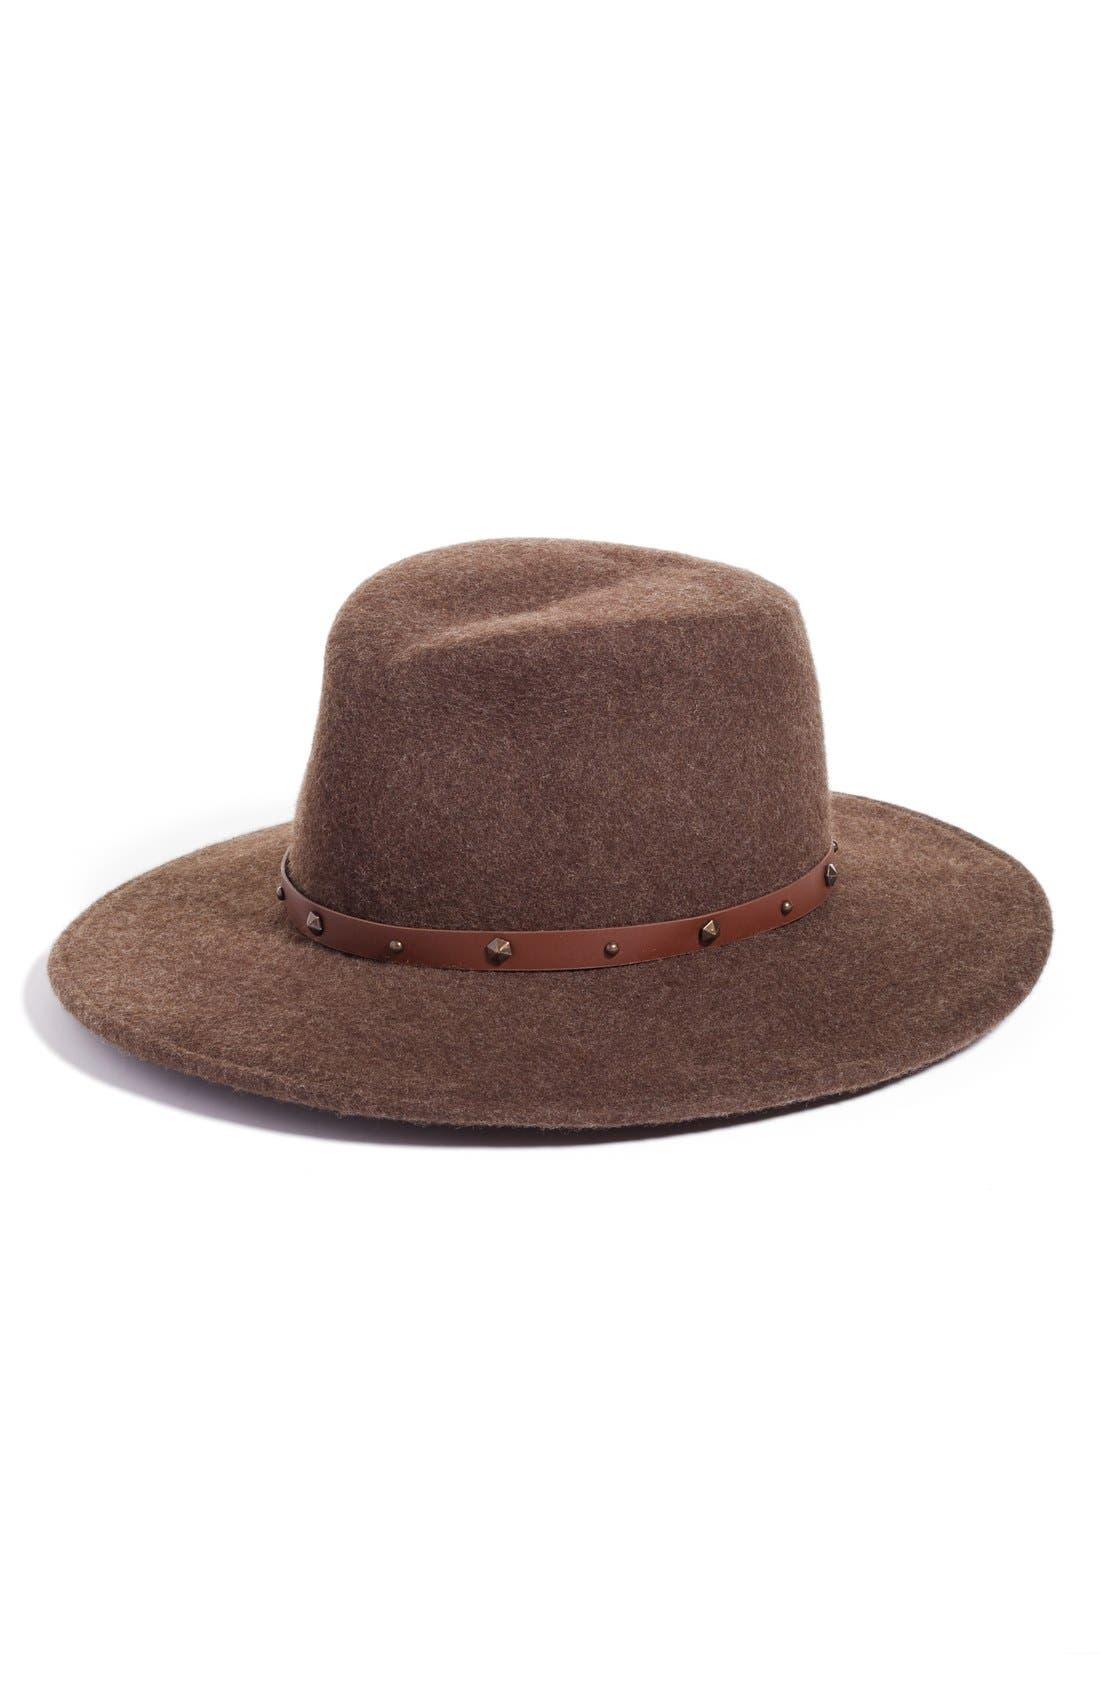 Eric Javits Karli Wool Felt Wide Brim Hat